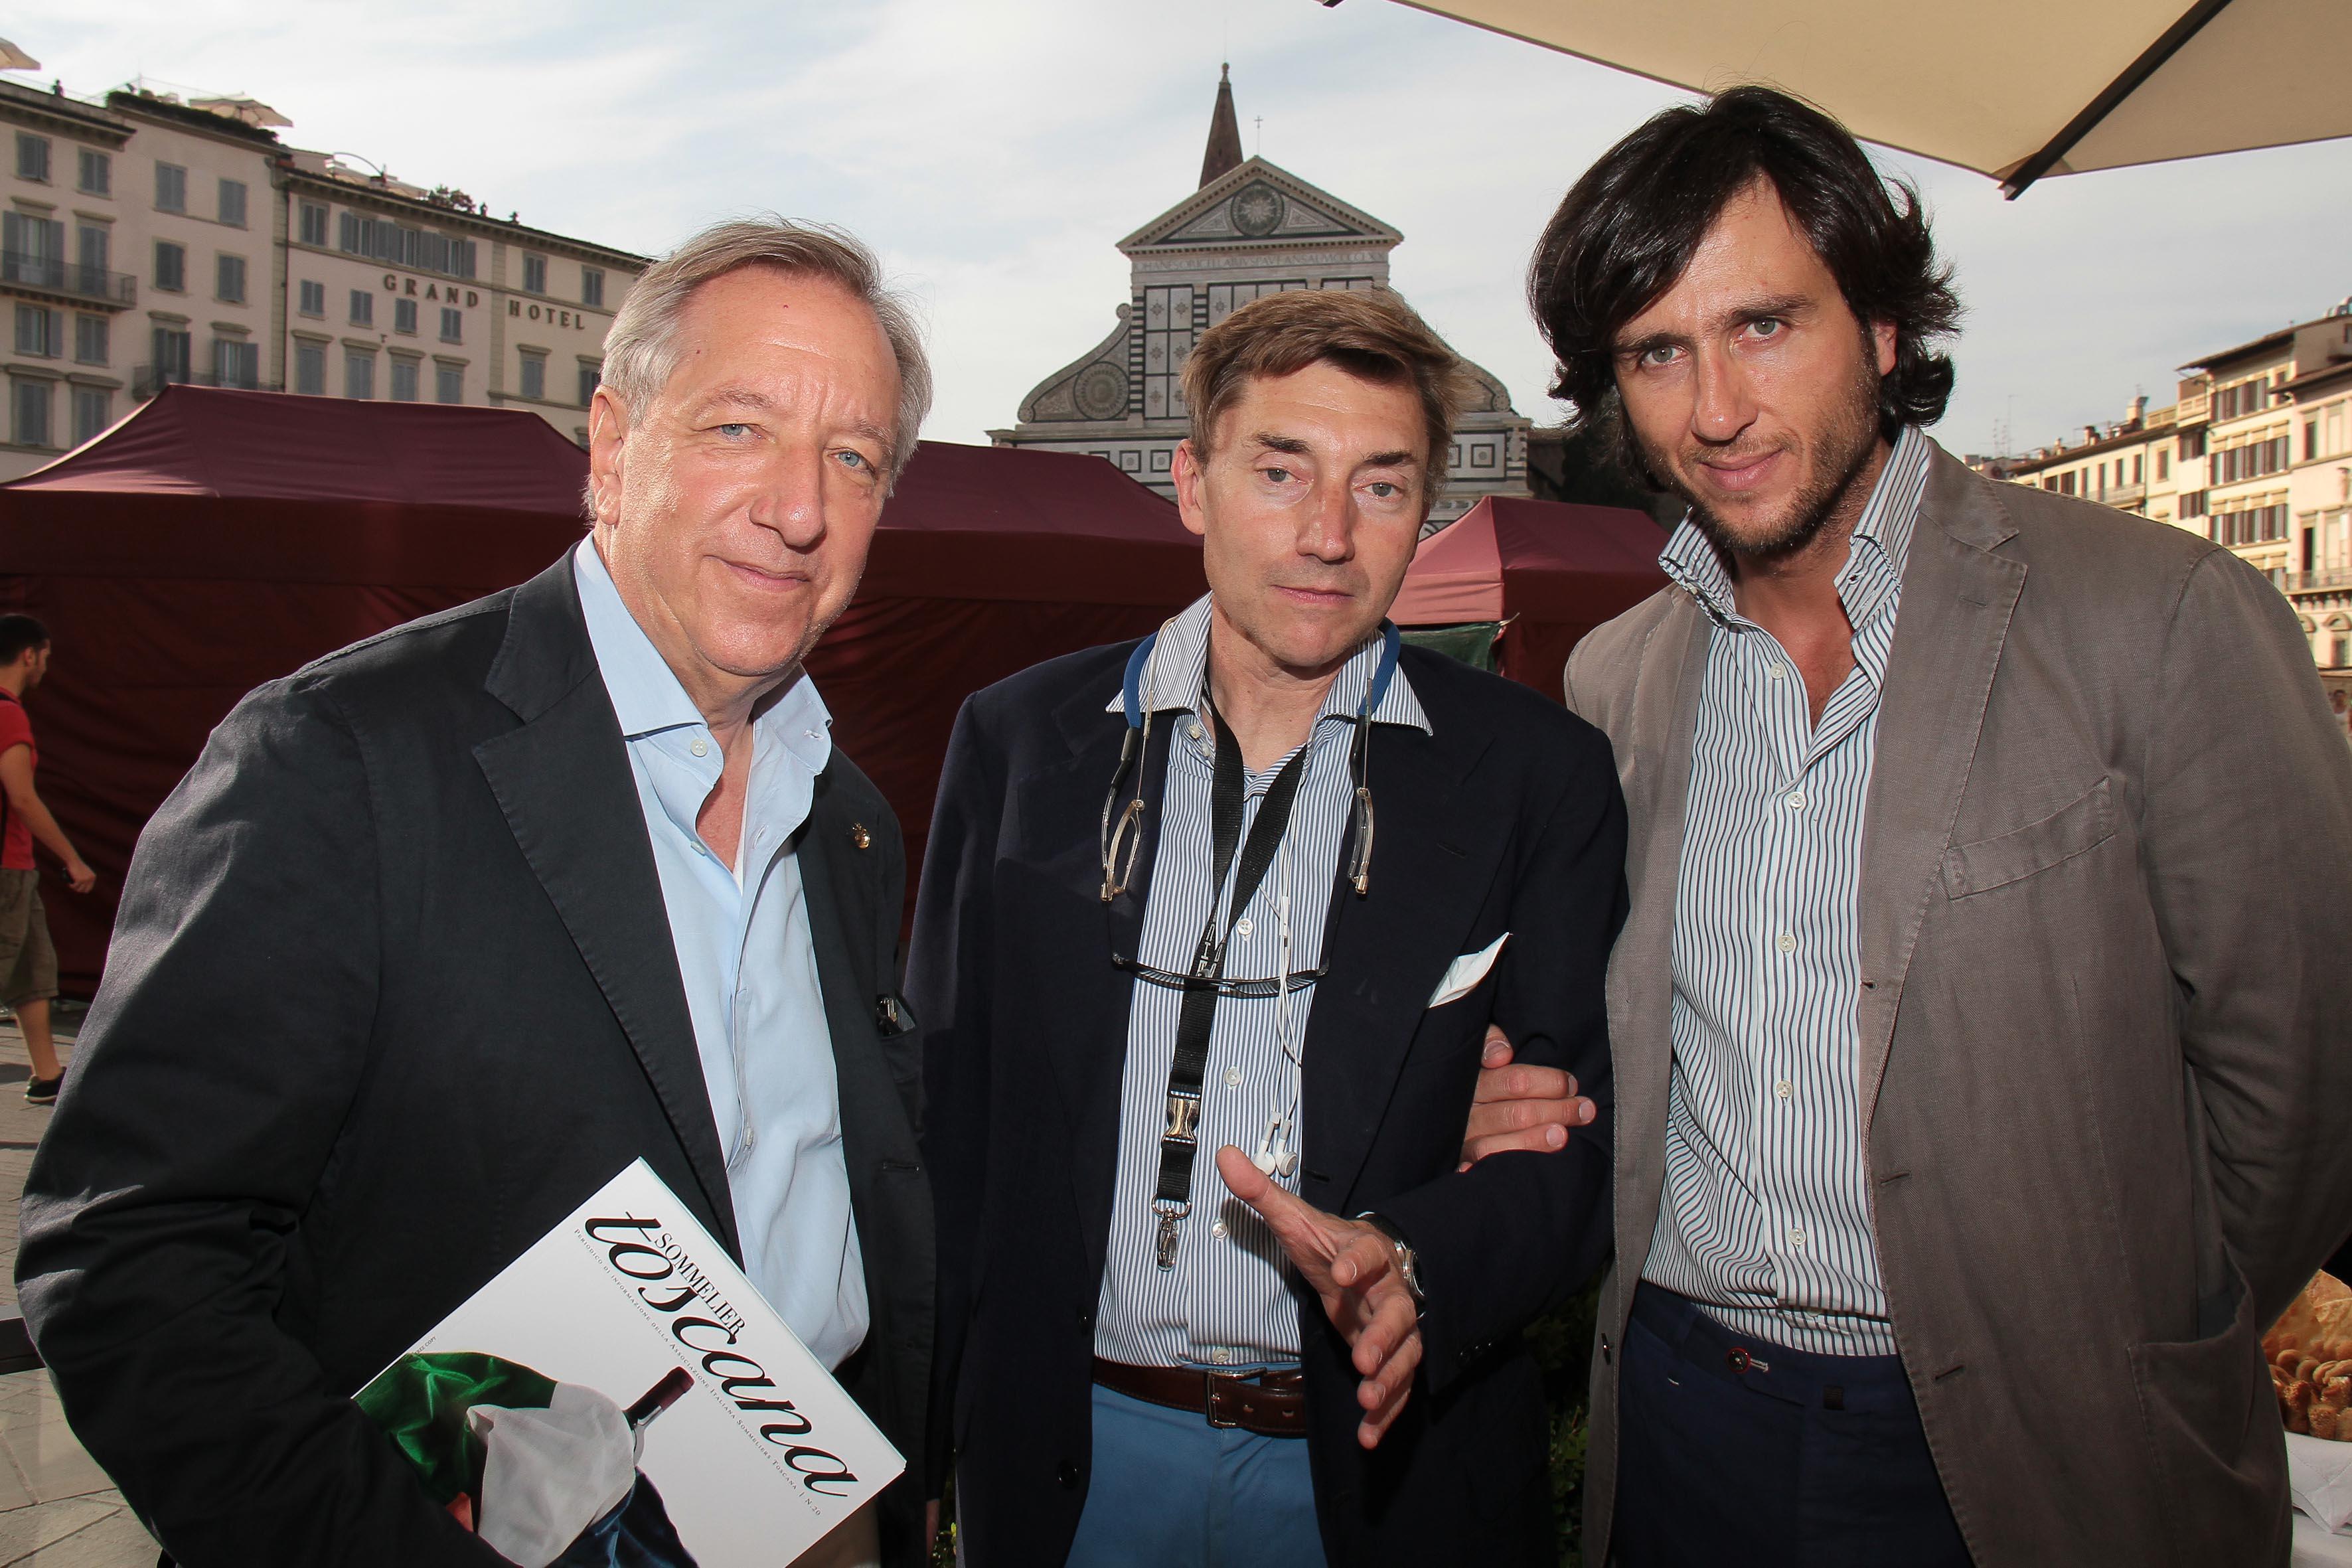 PRESSPHOTO Firenze, JK Place, Toscana Sommelier. Nella foto Osvaldo Baroncelli, Marco Raveggi e Alex Lana giuseppe cabras/new press photo